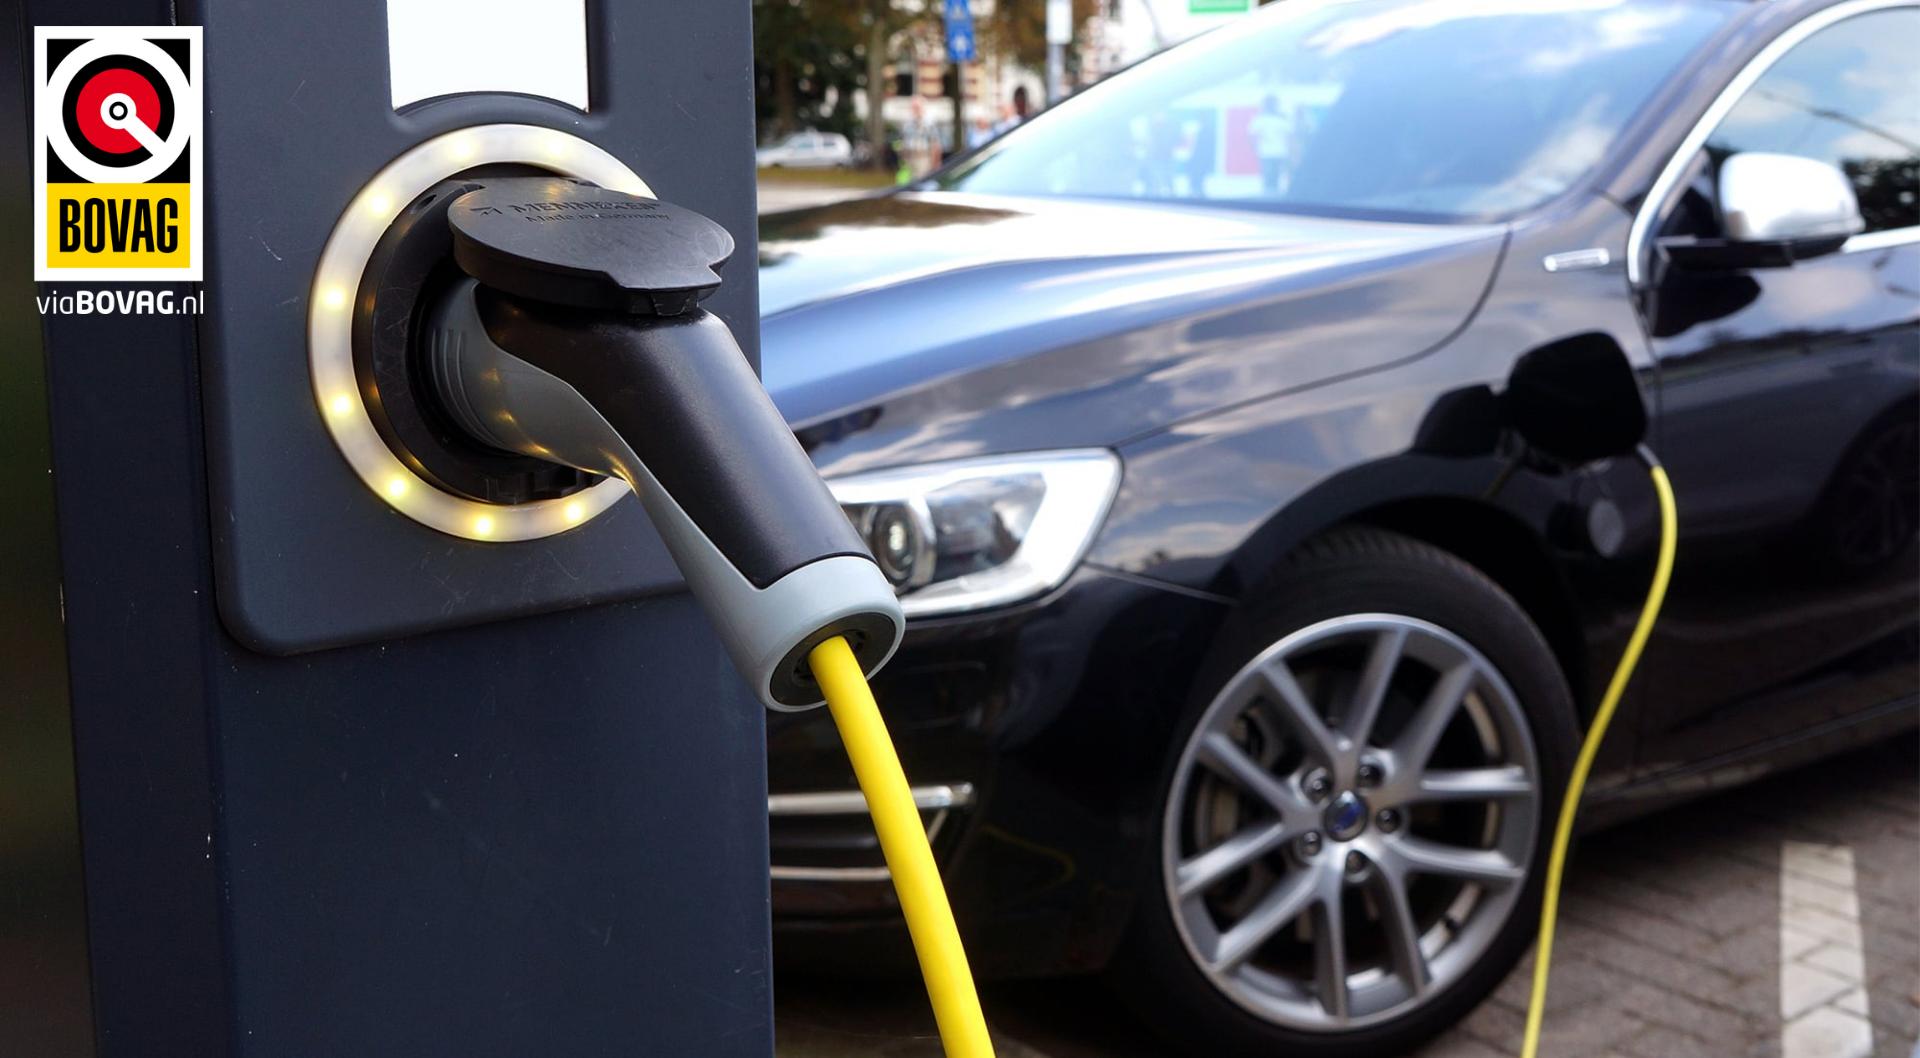 Aanschafsubsidie Elektrische Auto In 2020 Viabovag Nl